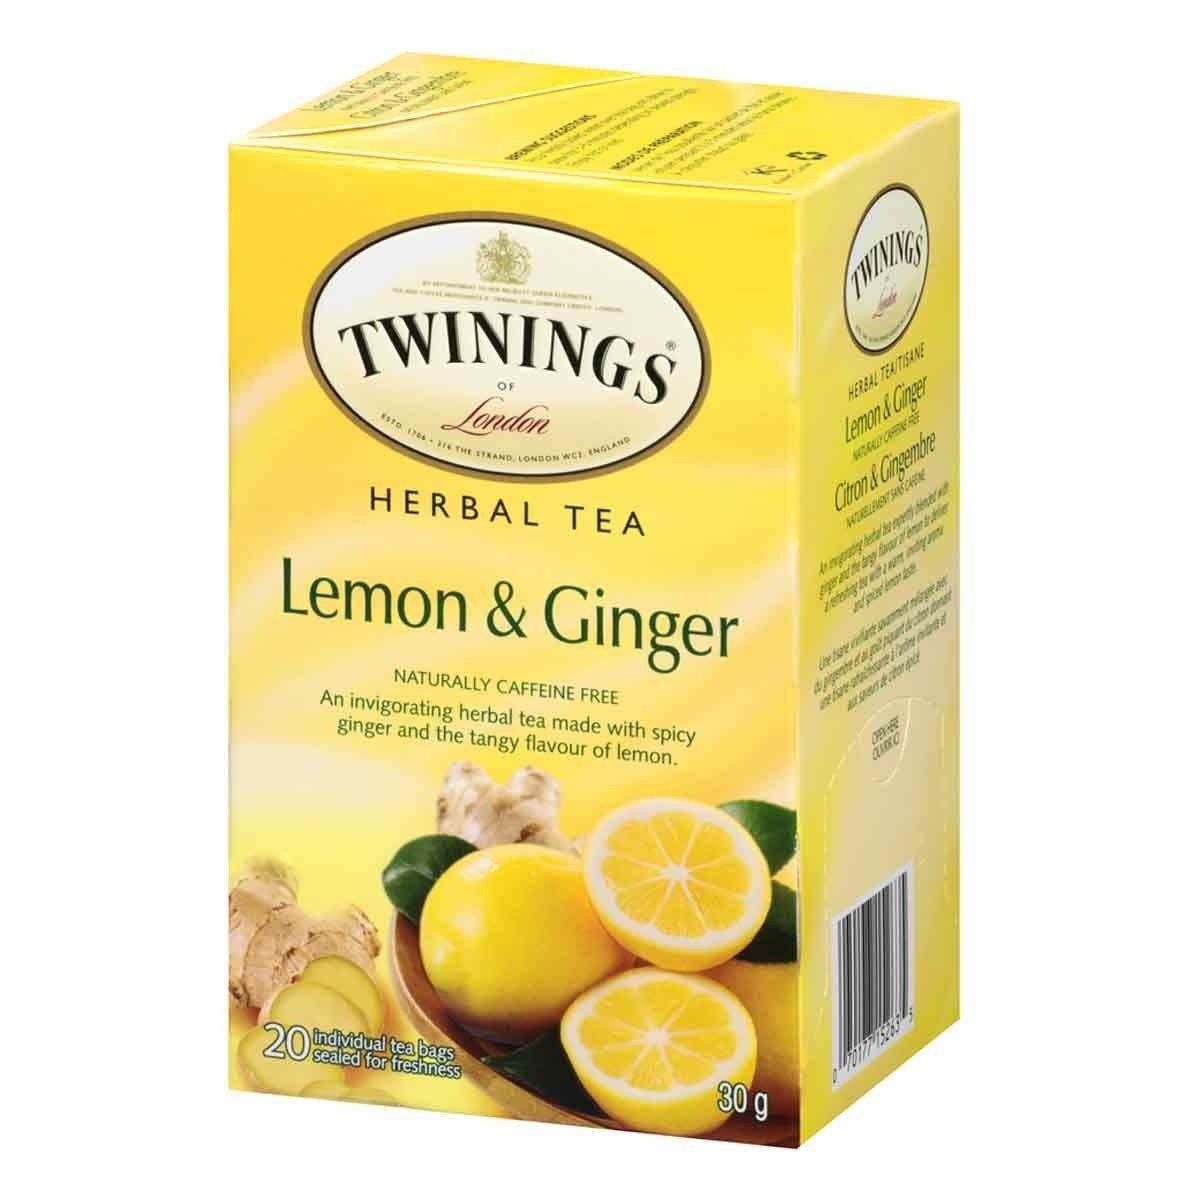 Twinings Lemon Ginger Herbal Tea